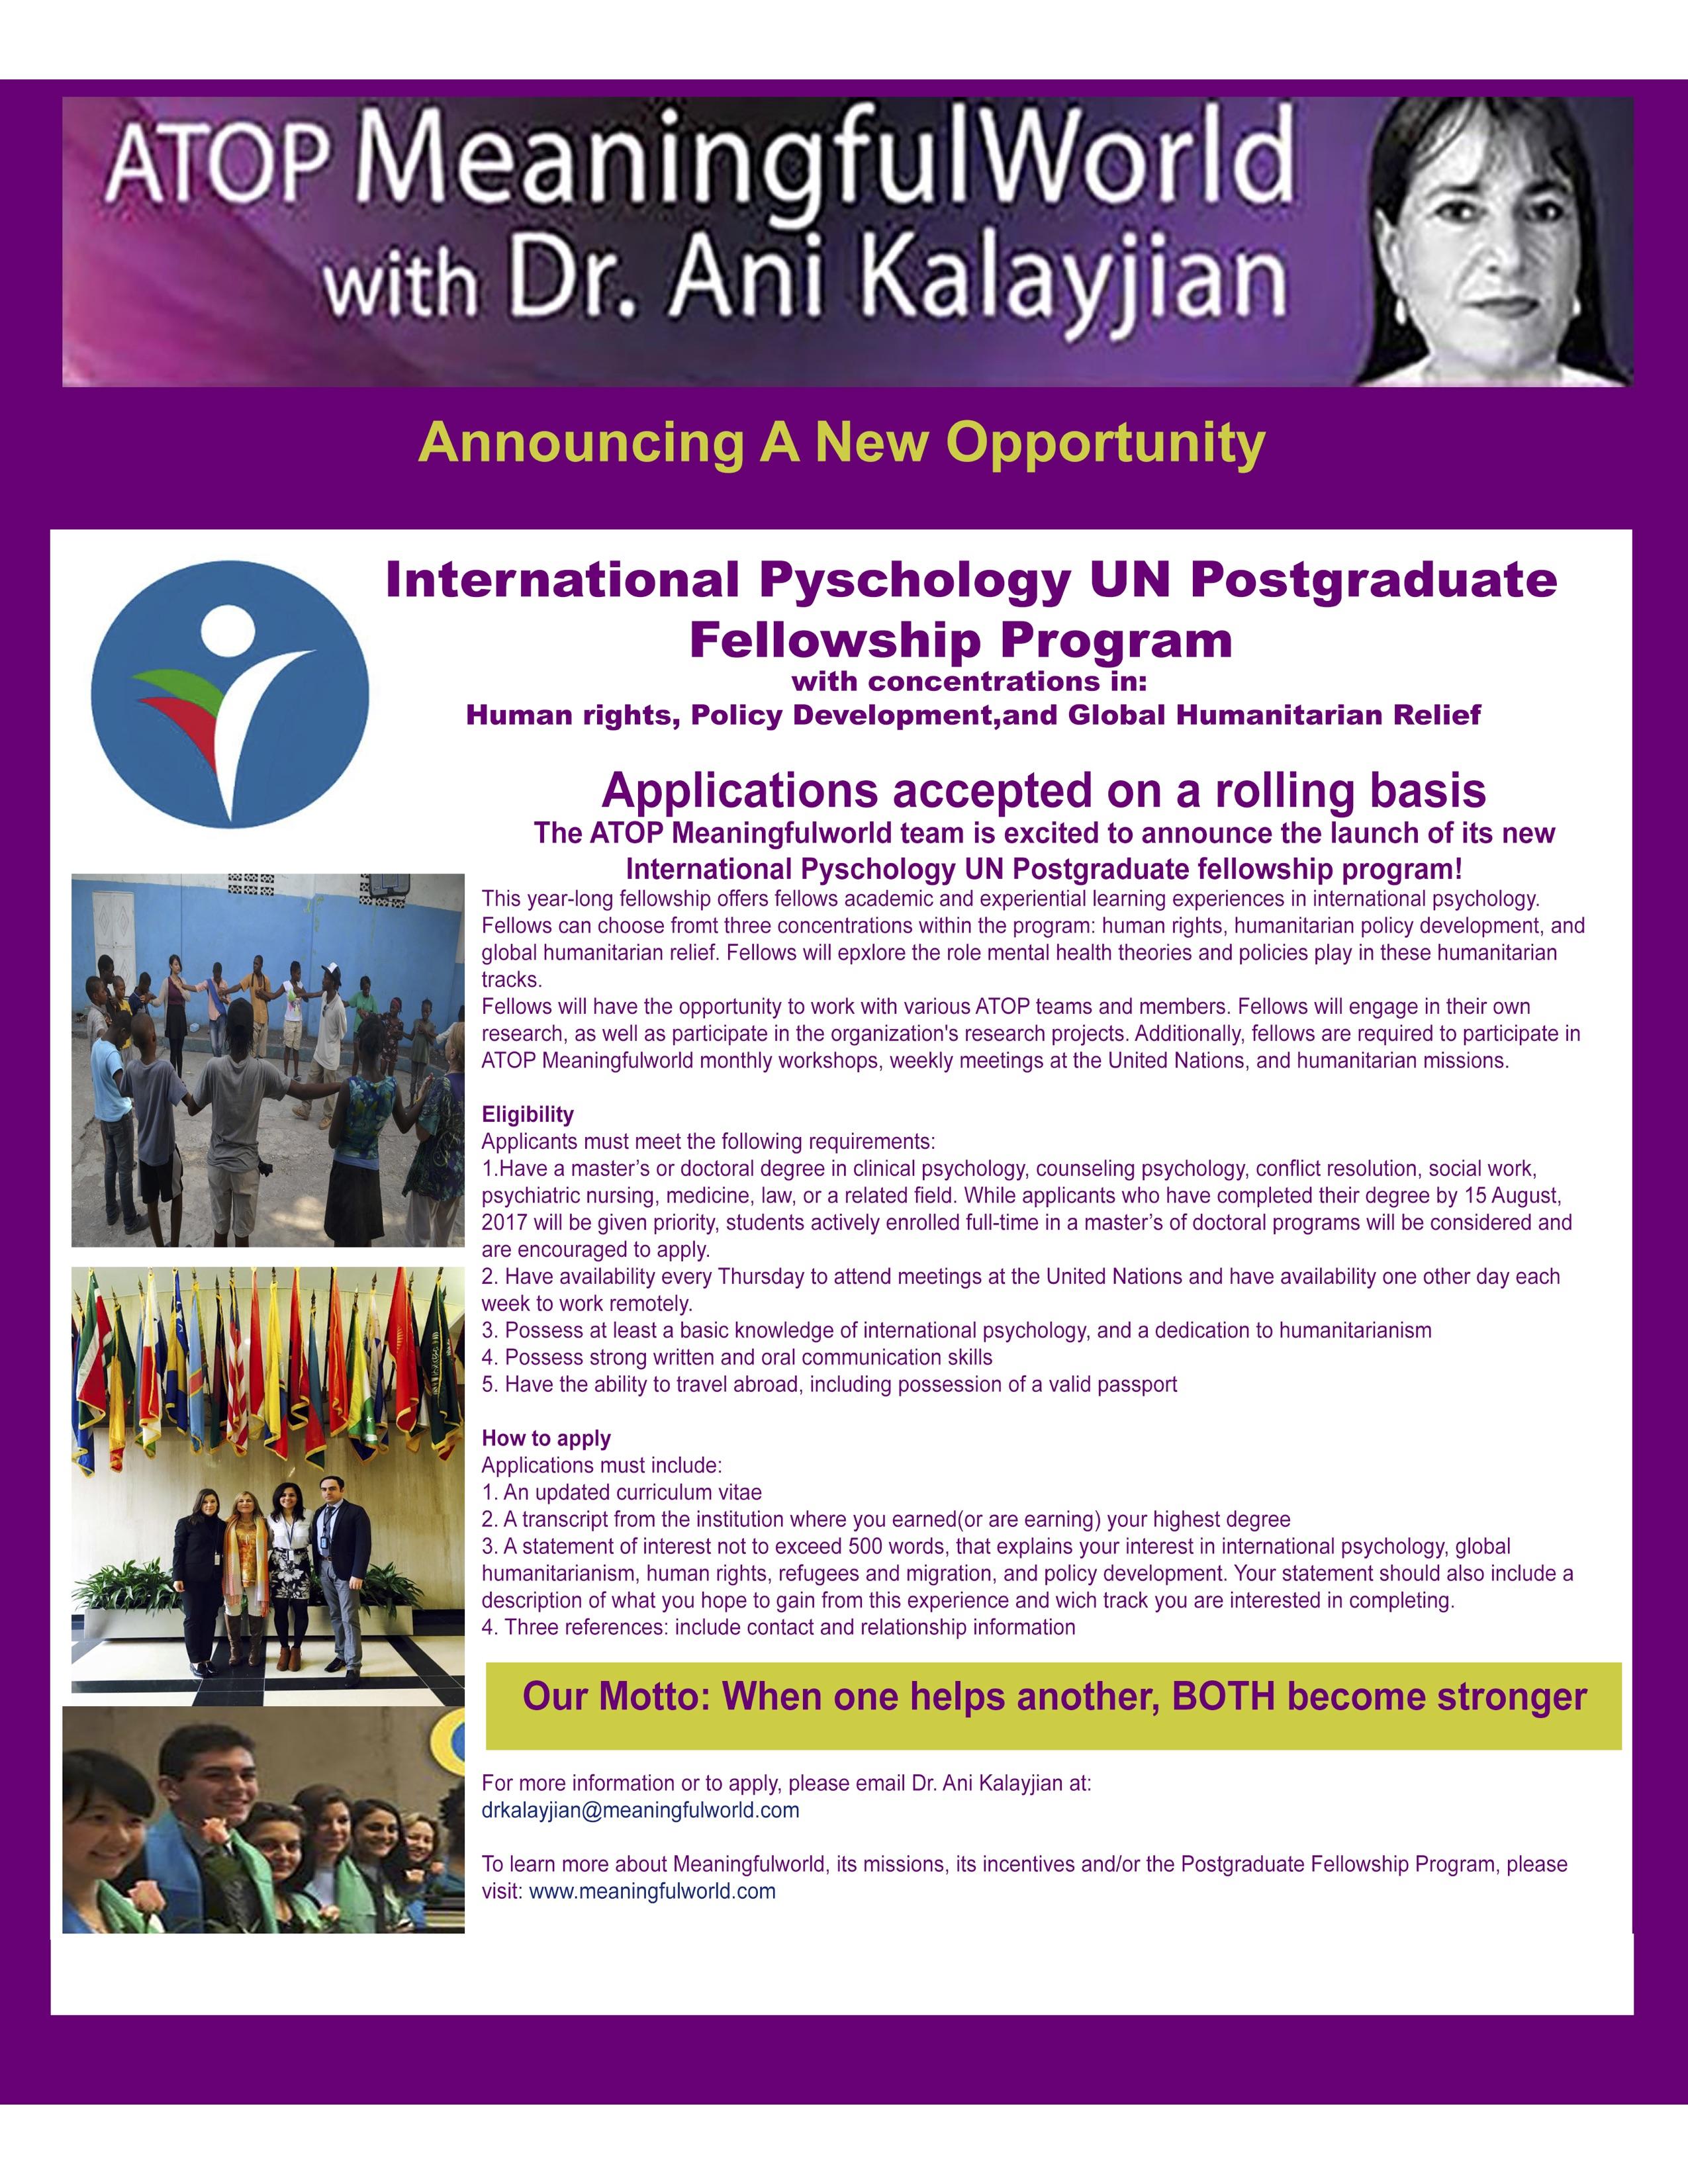 Meaningfulworld Postgraduate Fellowship at UN 2017